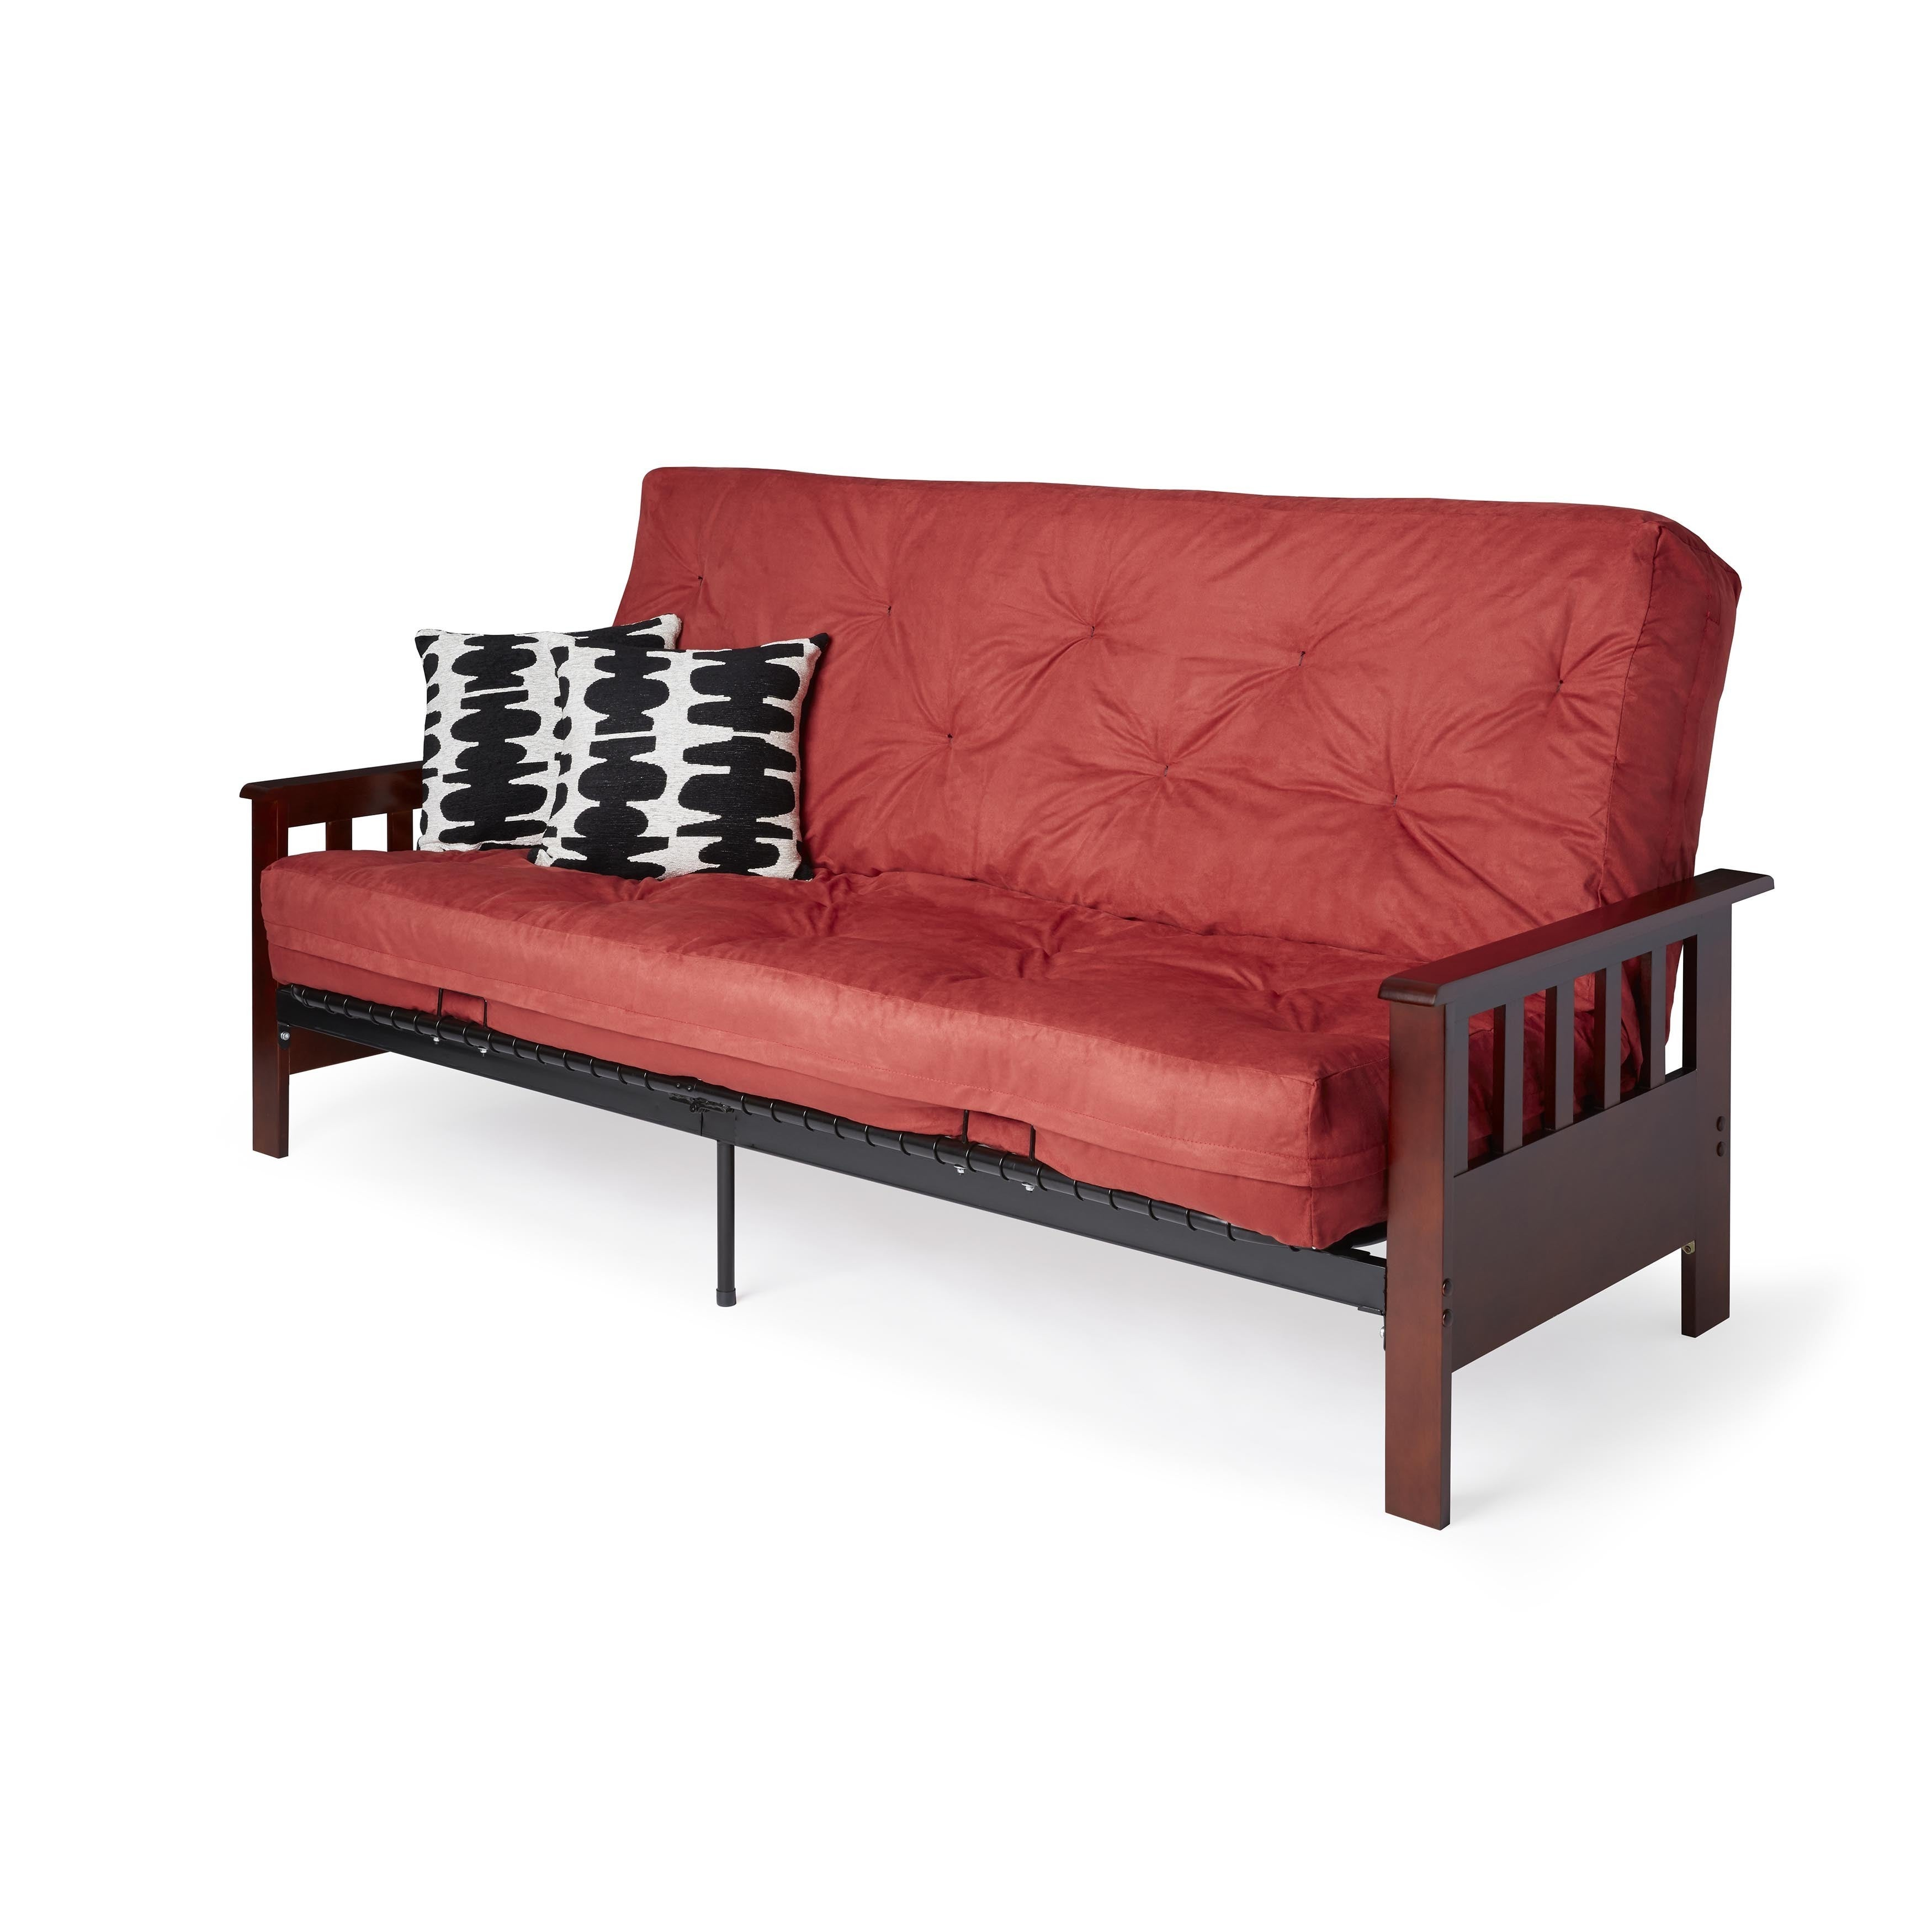 Outdoor Futon Cushion